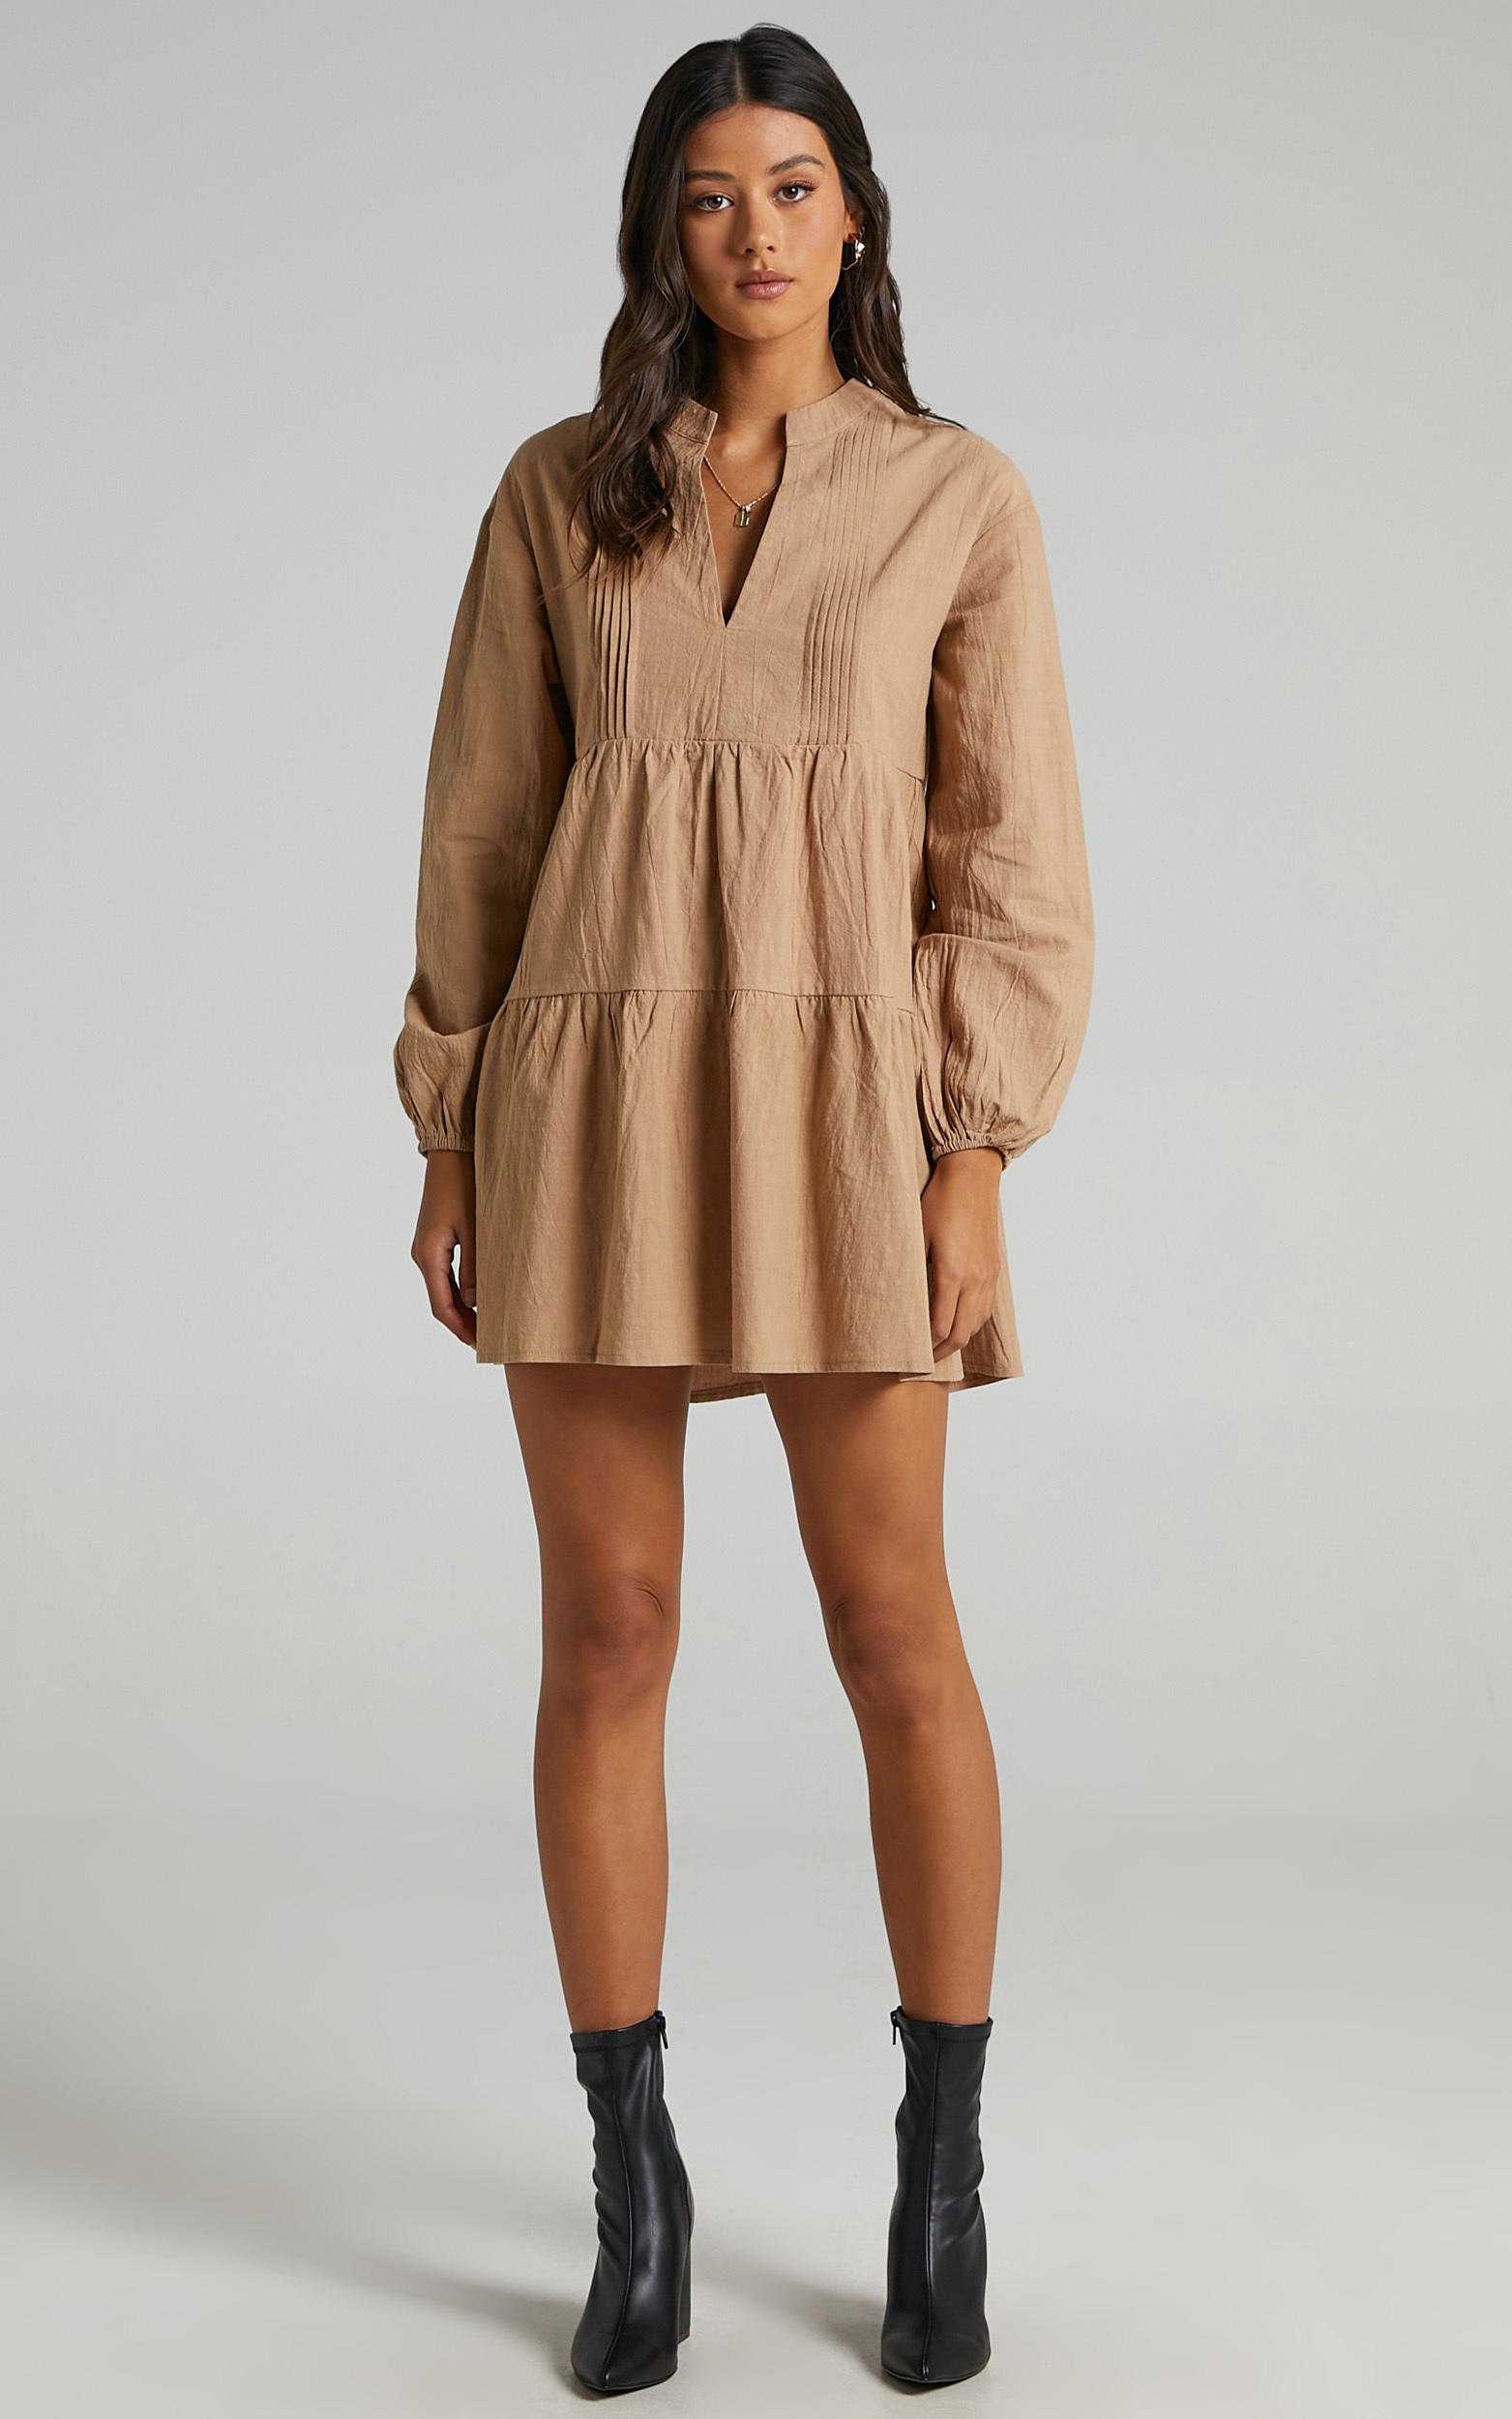 Estelita Dress in Beige - 04, BRN1, hi-res image number null